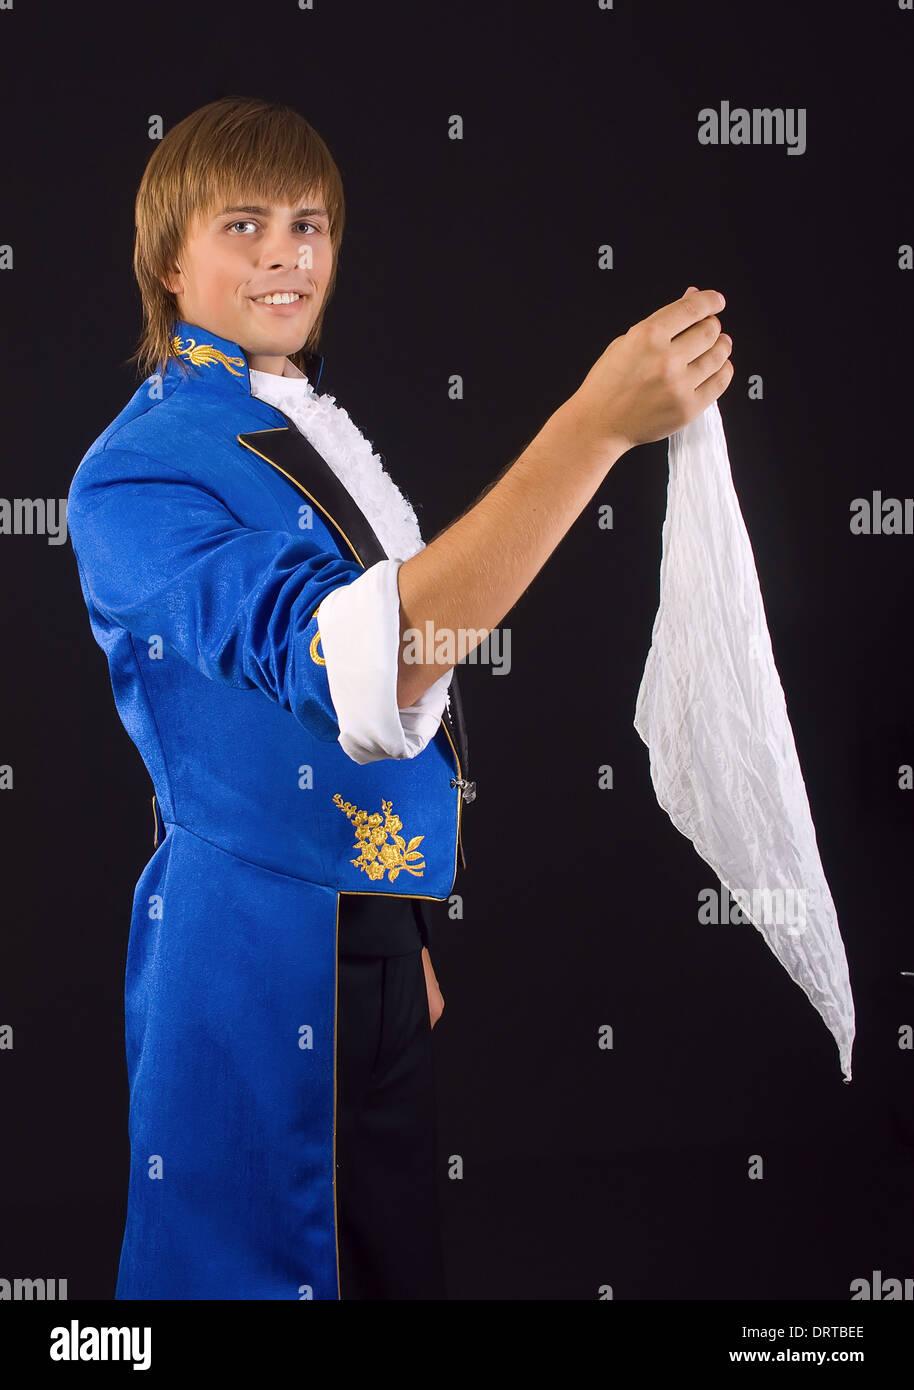 Prestidigitator in tail-coat with neckerchief. - Stock Image